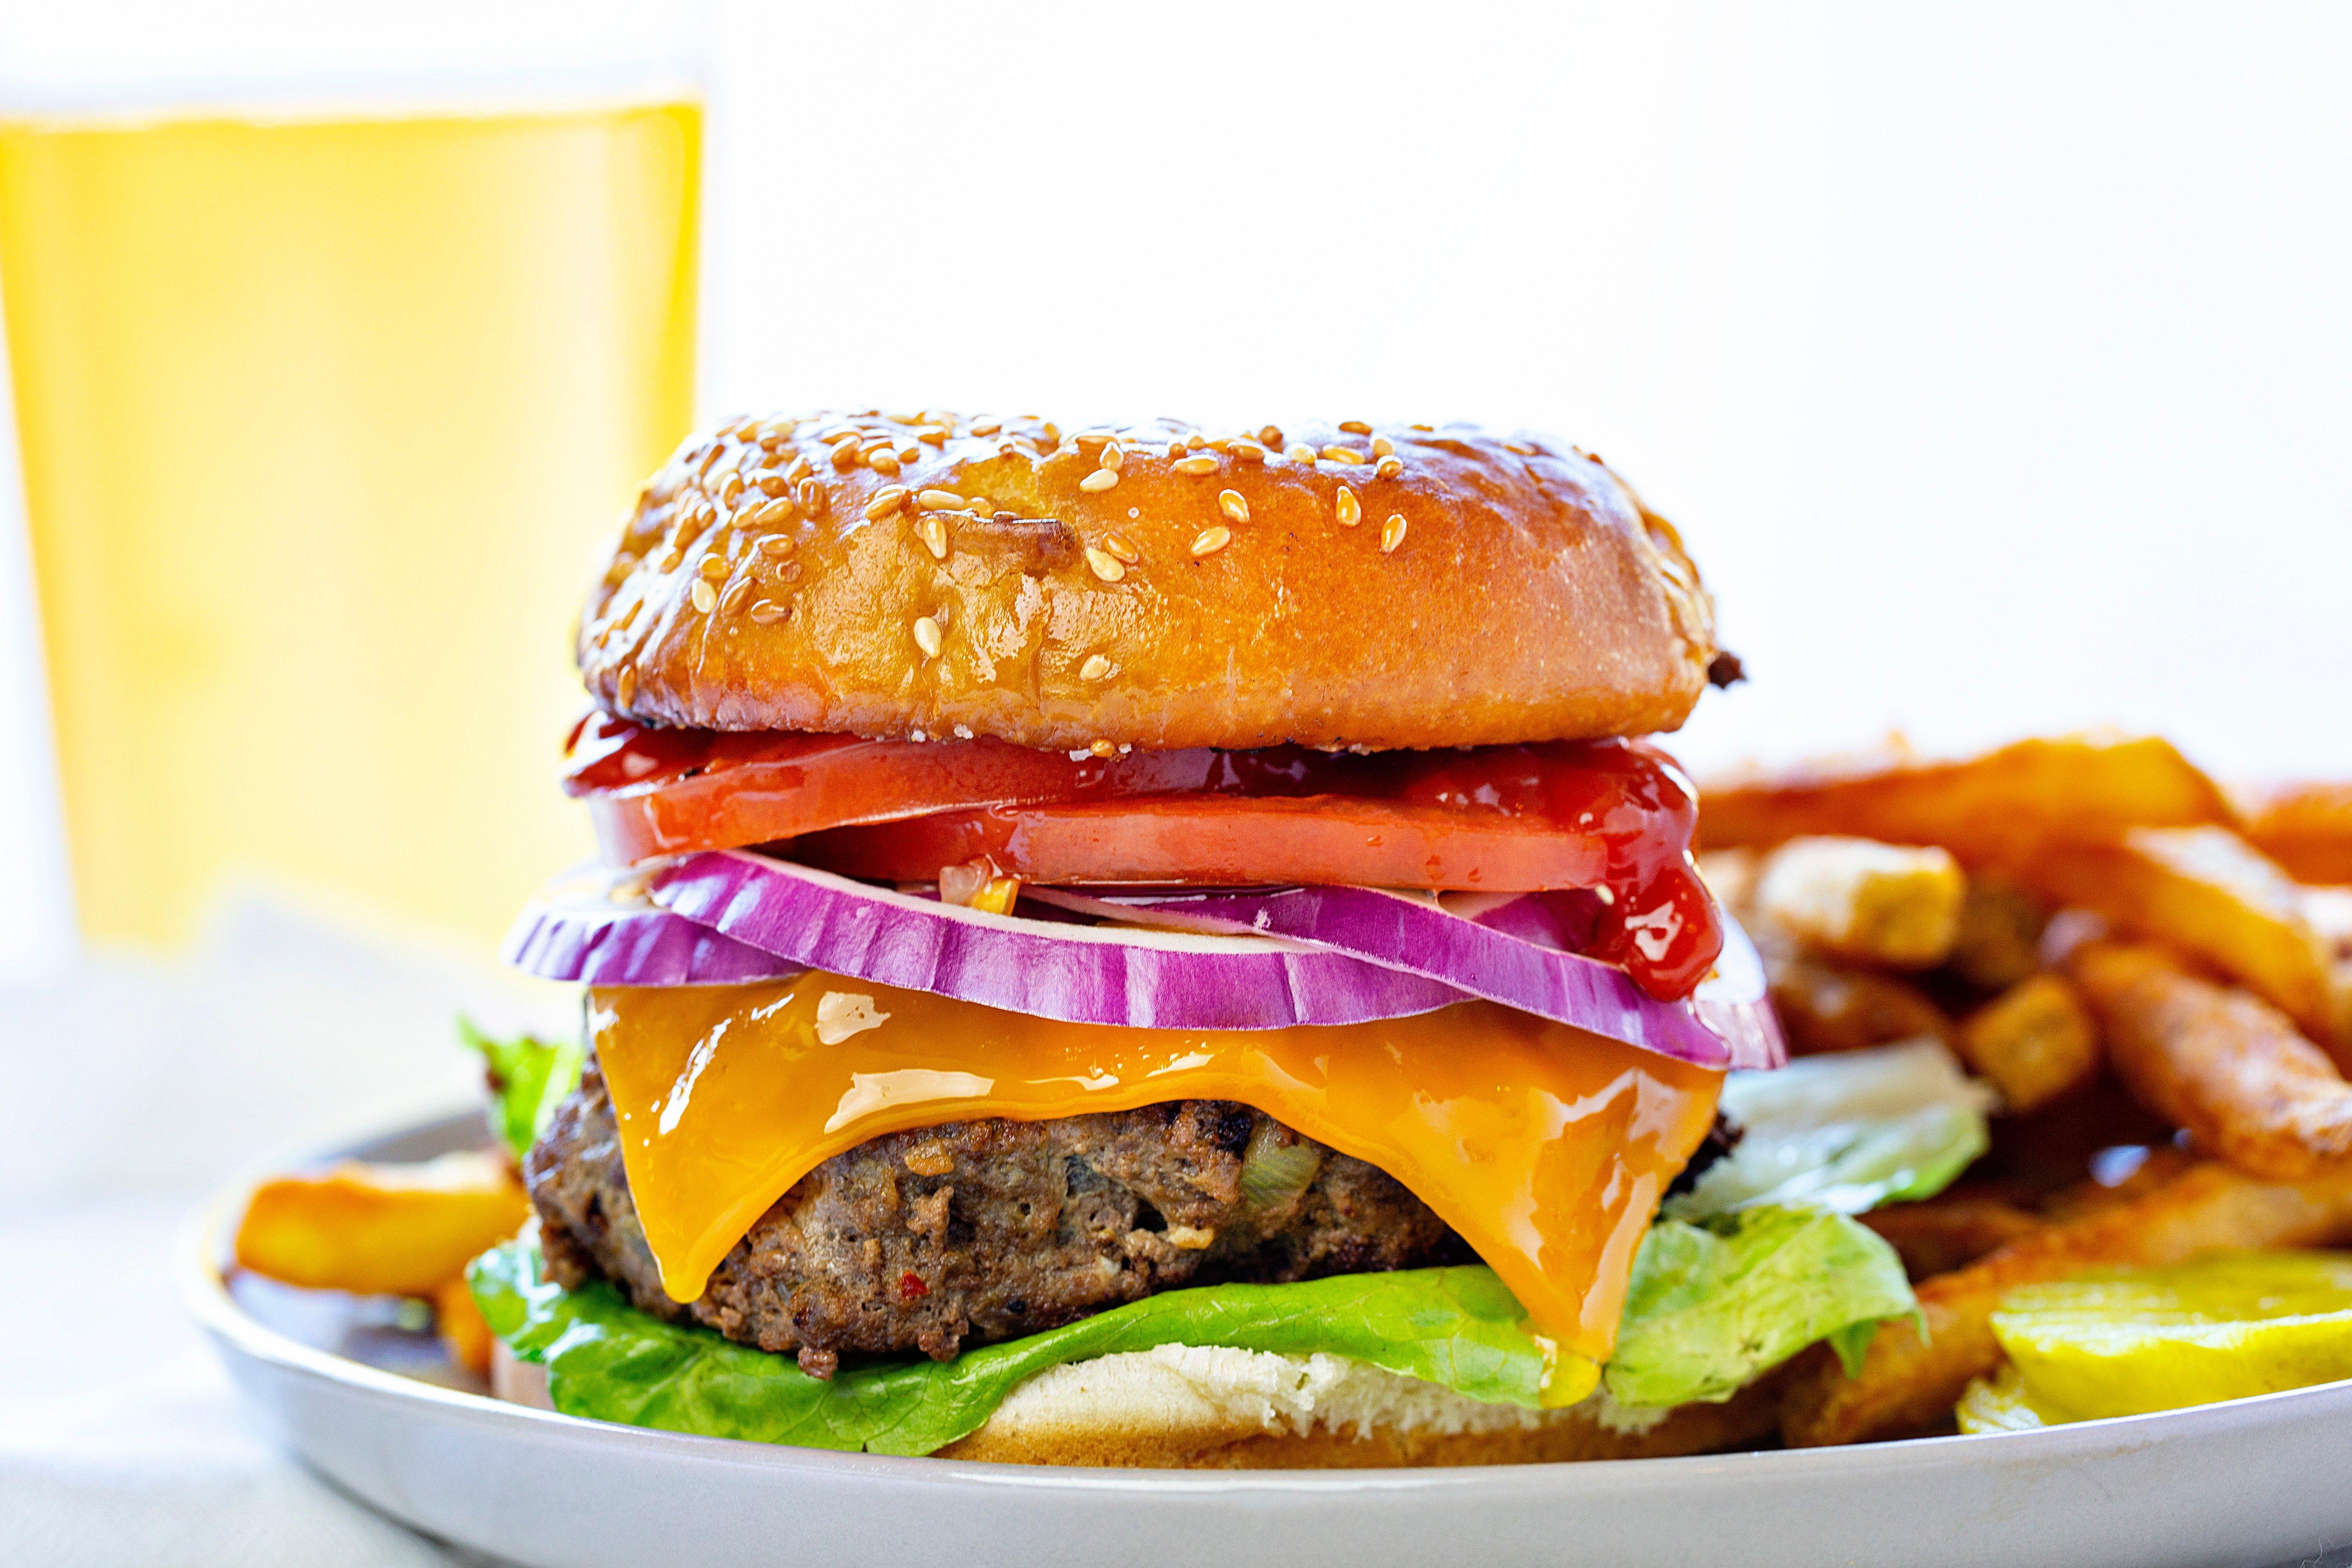 The Best Cheeseburger